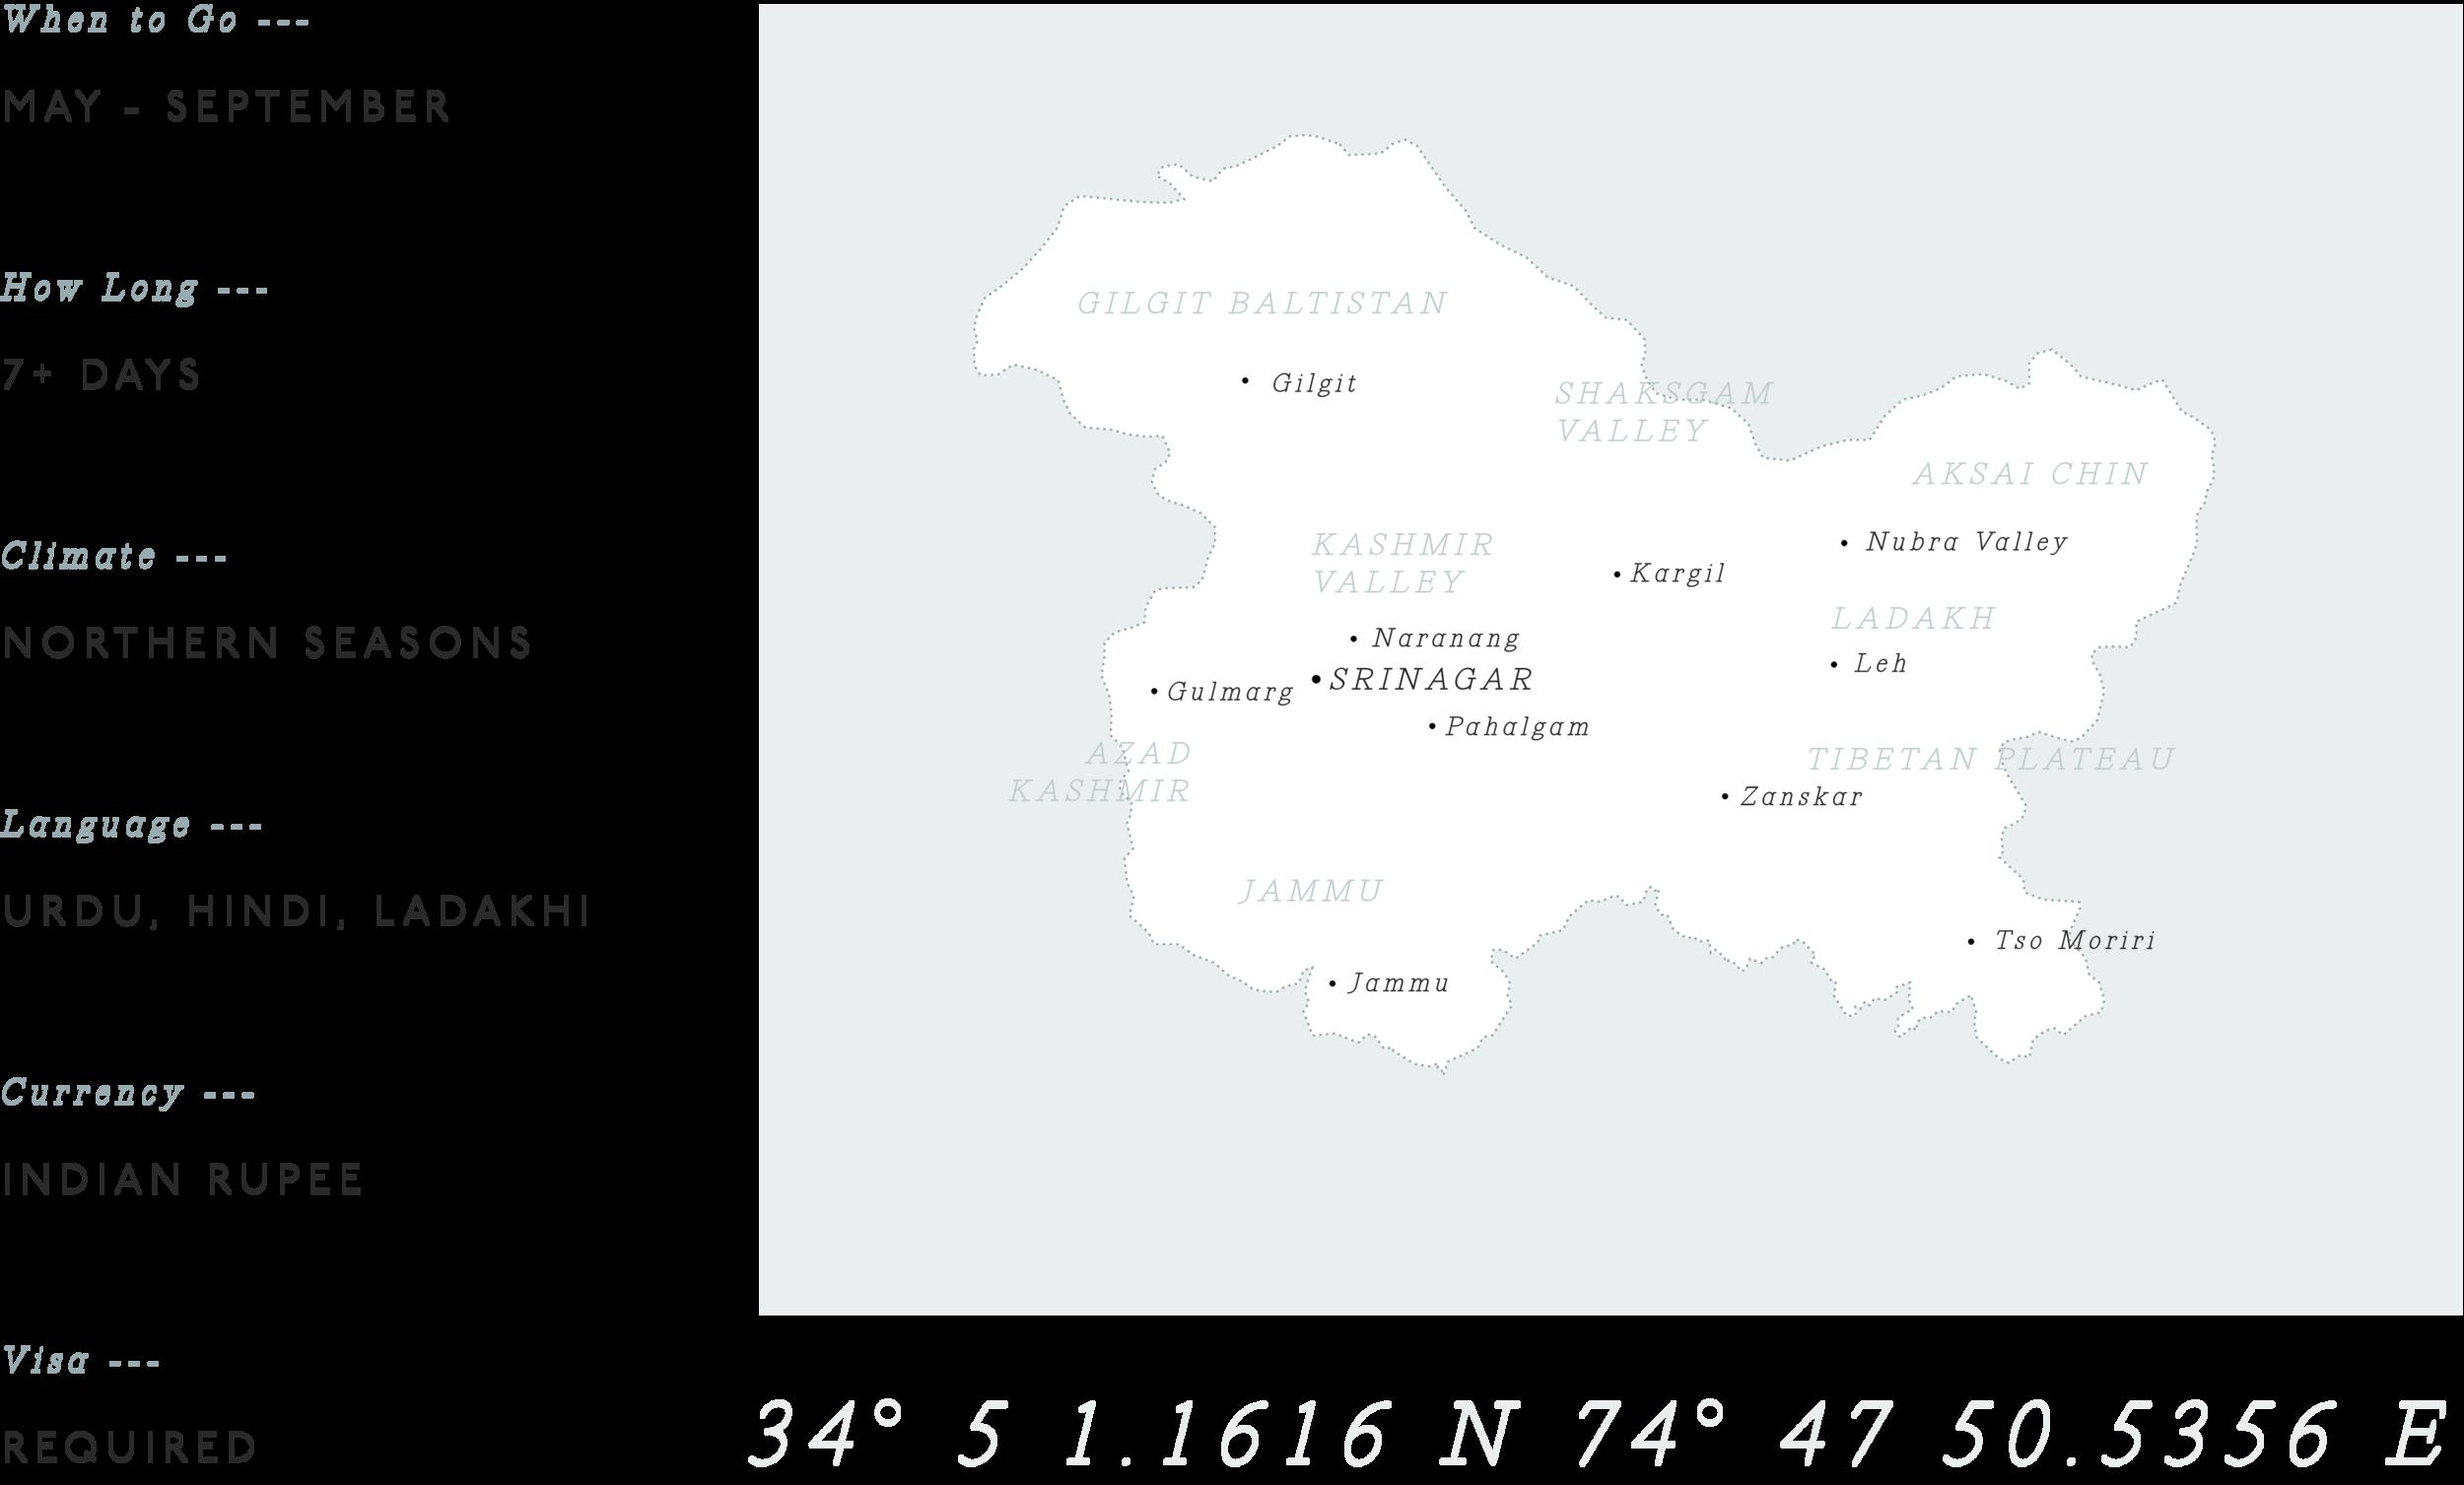 Kashmir+Ladakh 300dpi.png